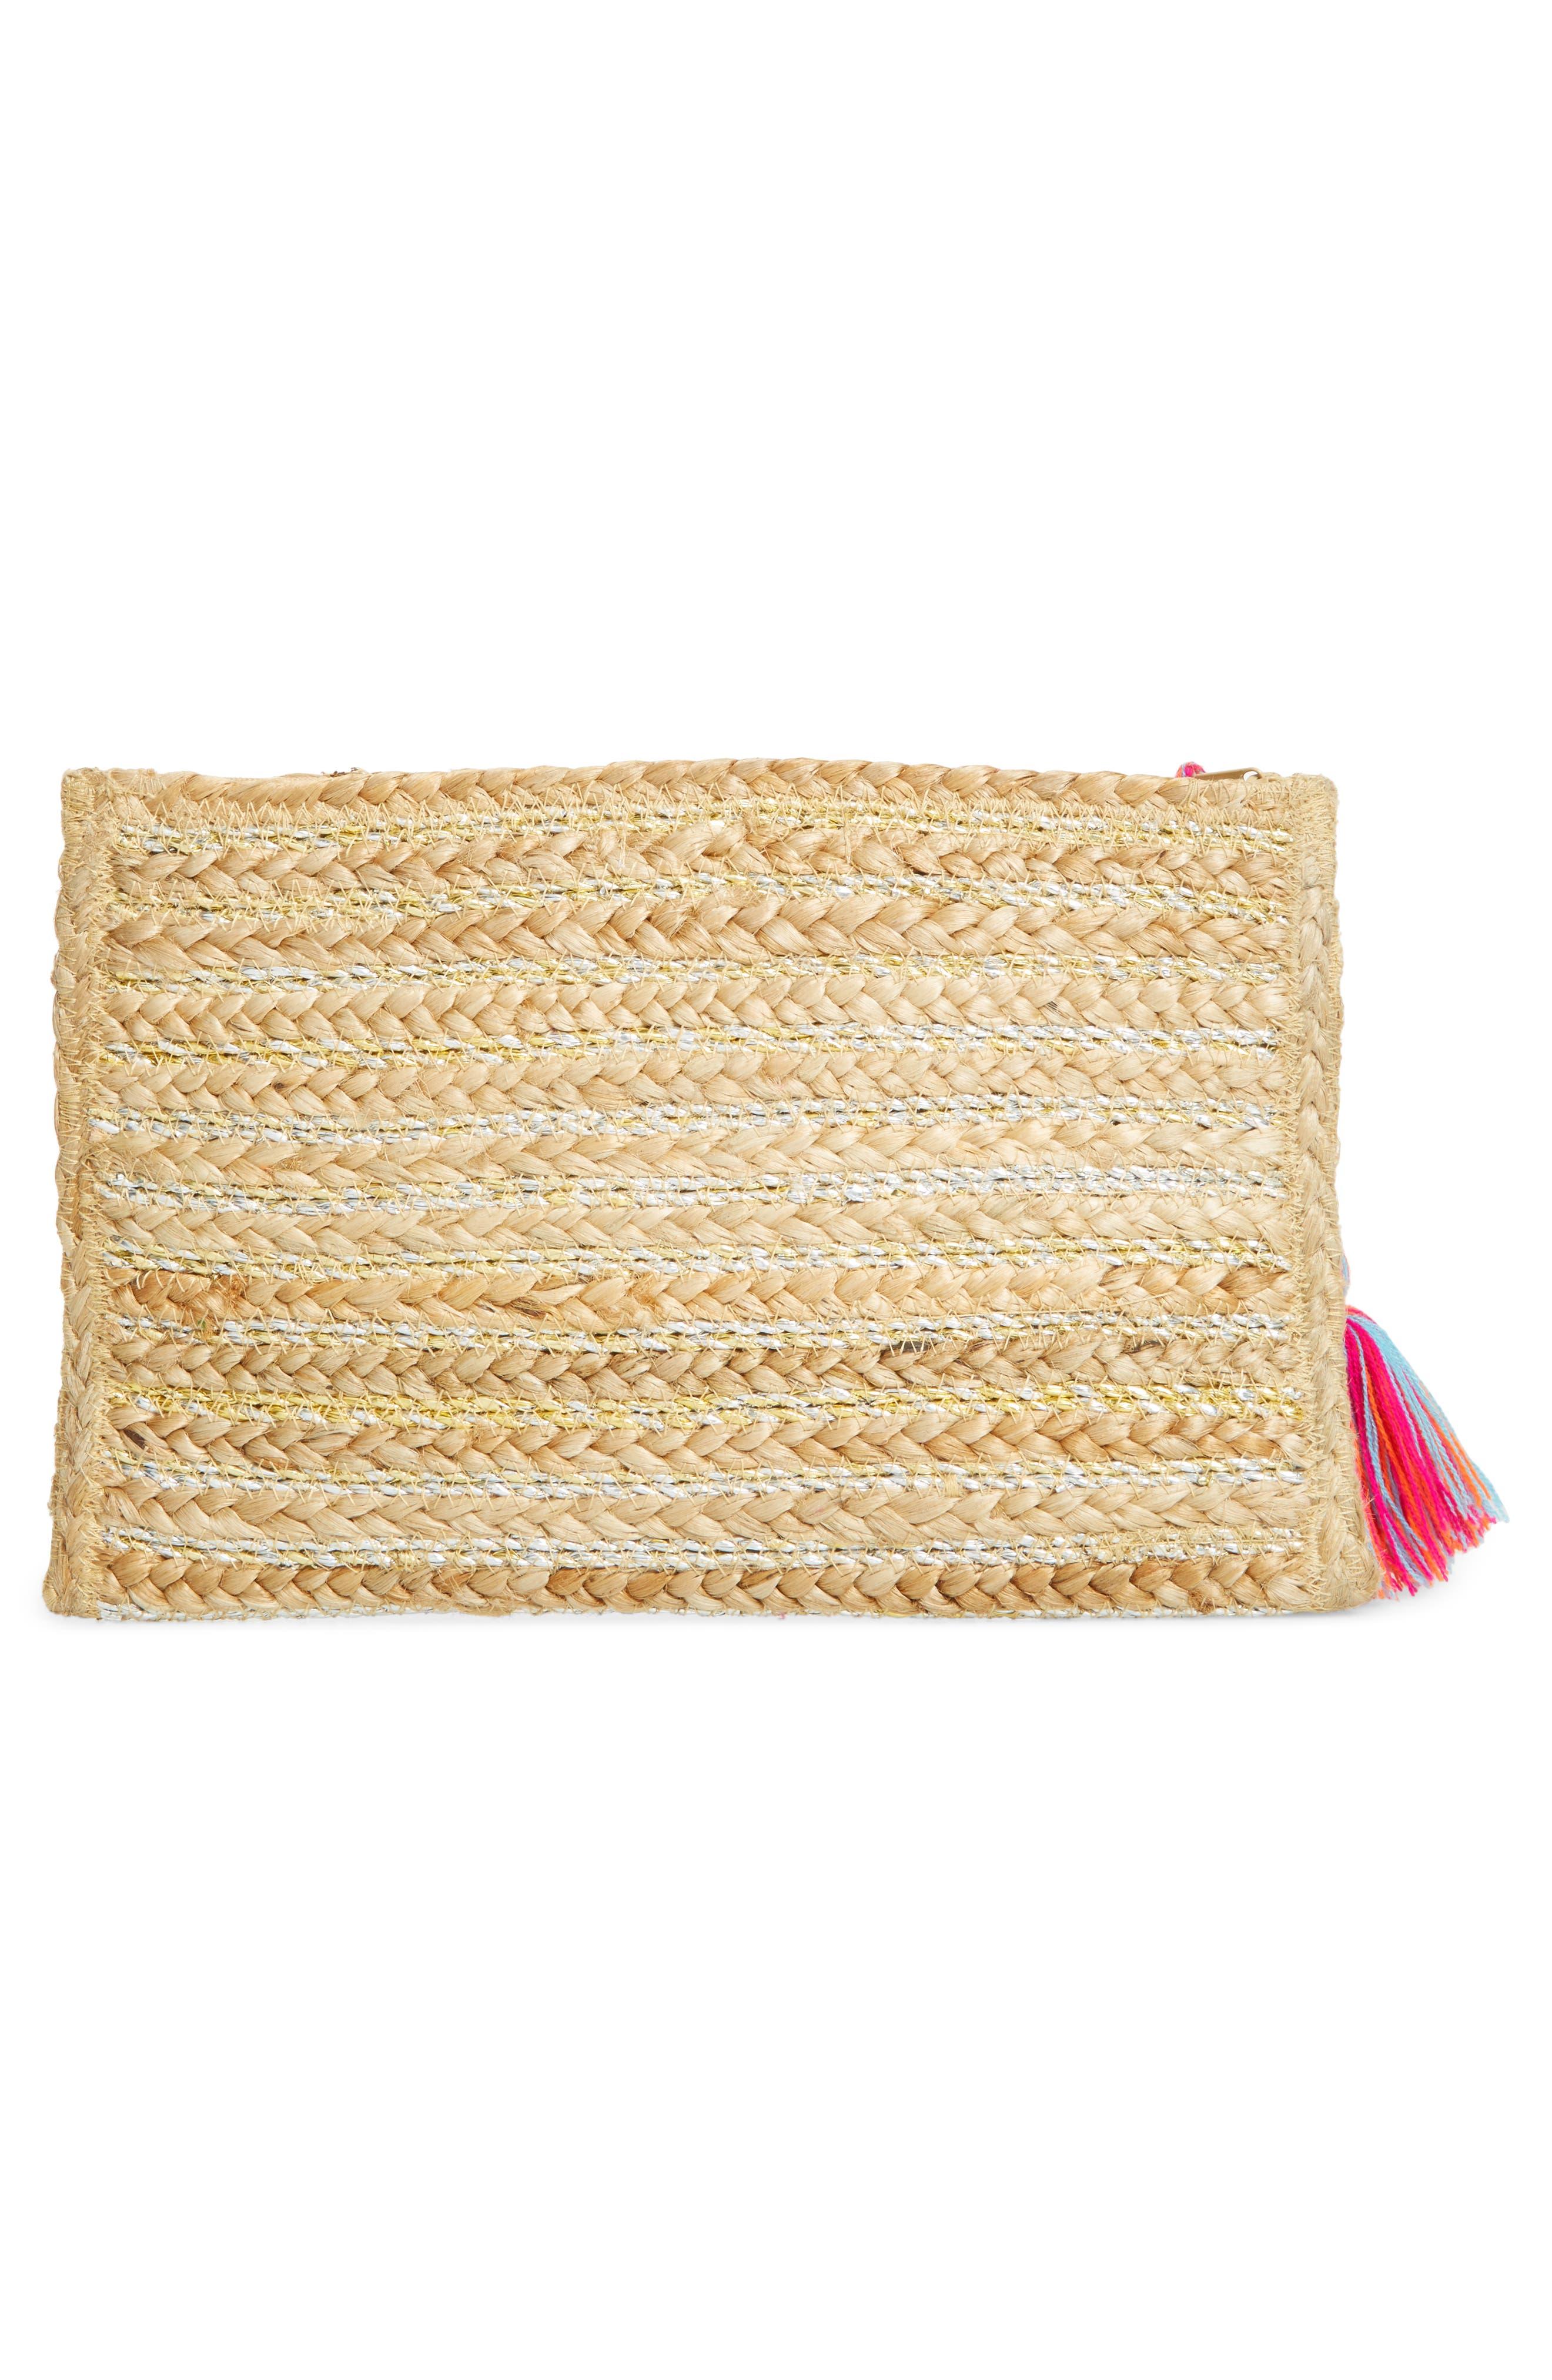 Alternate Image 3  - Shiraleah Kali Embellished Straw Clutch